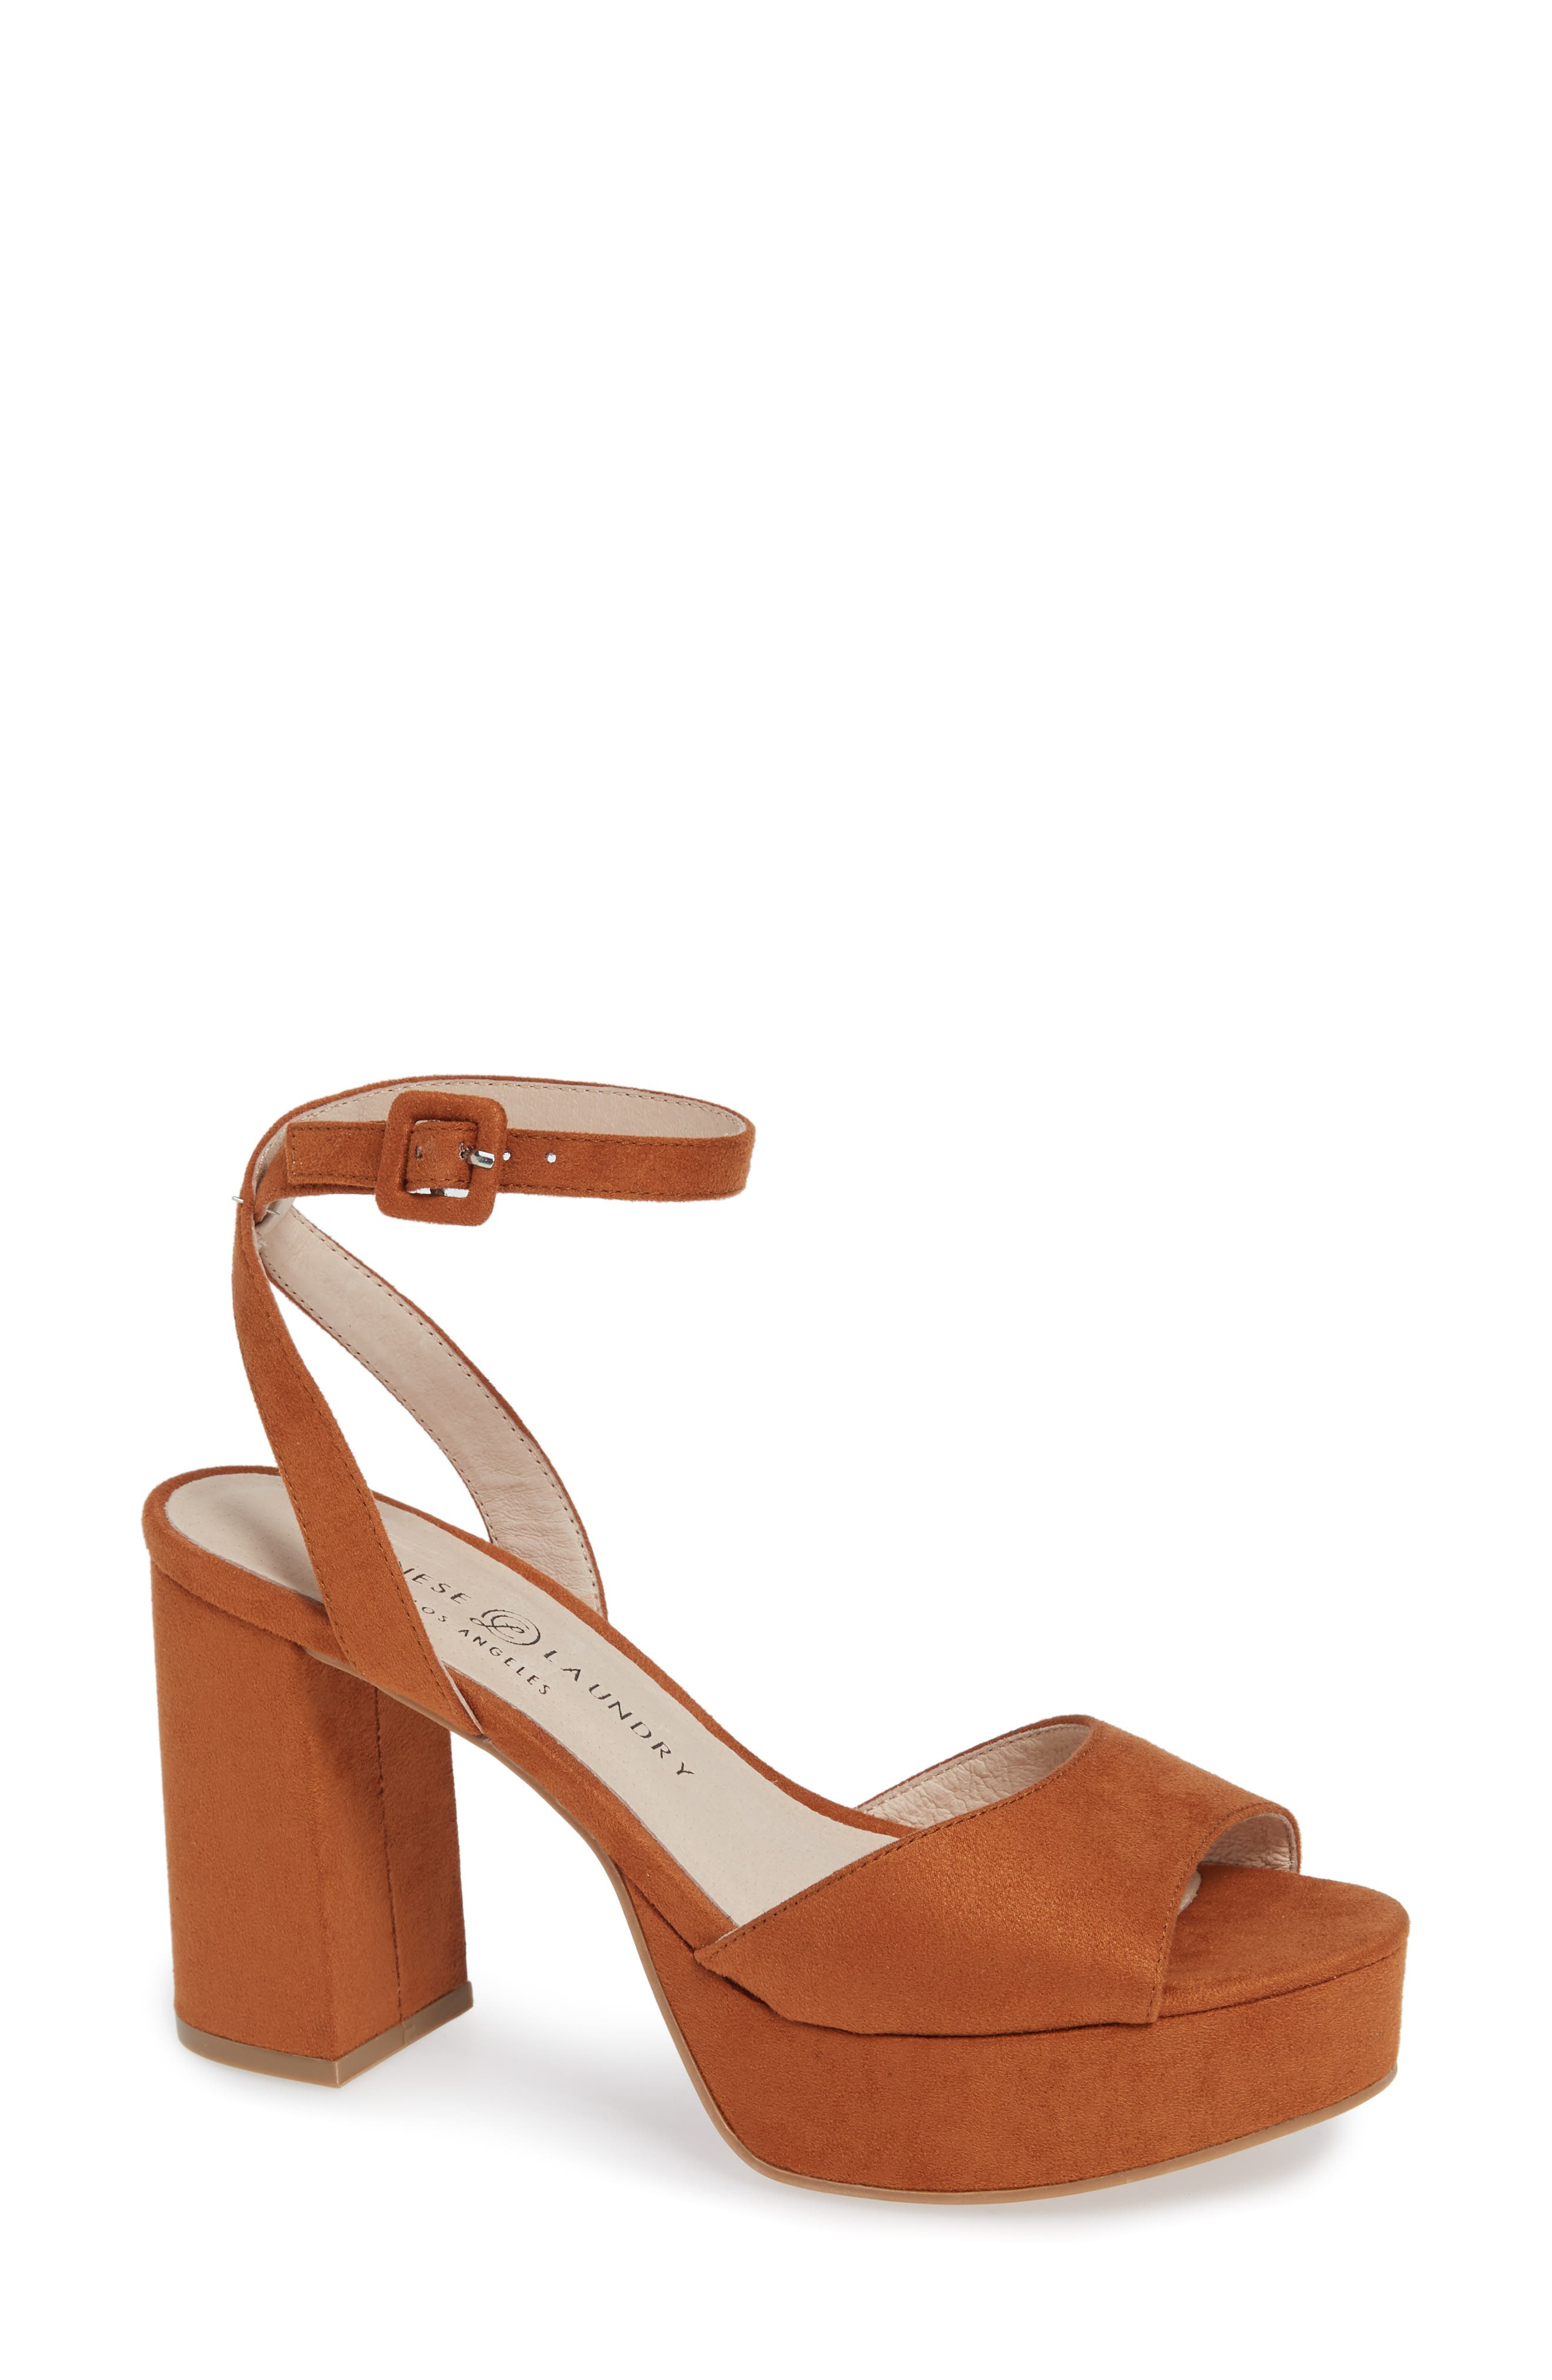 Theresa Platform Sandal,                             Main thumbnail 1, color,                             UMBER SUEDE